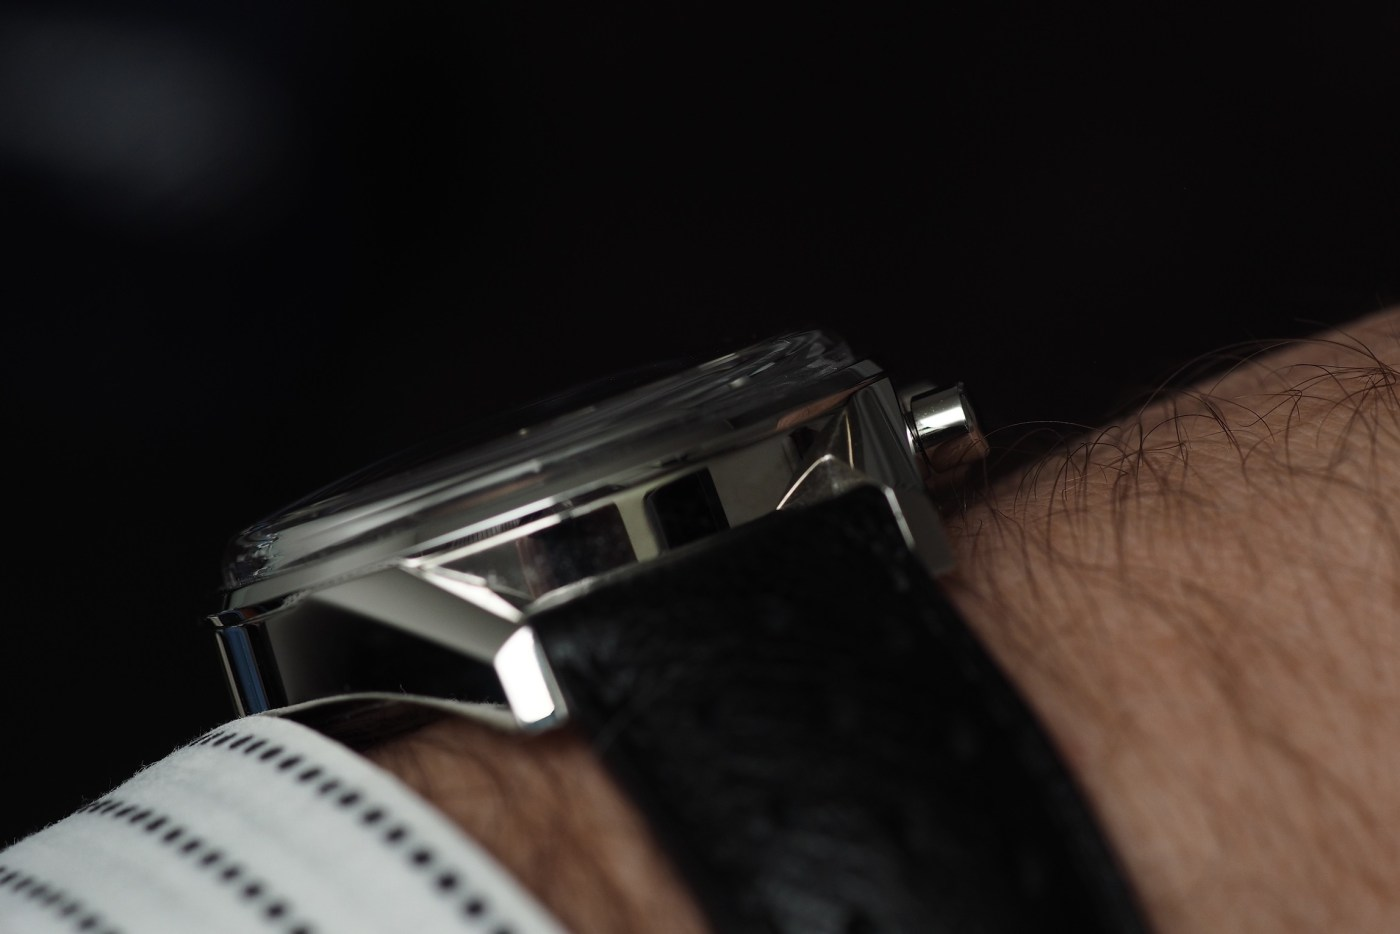 TAG Heuer Carrera Calibre 18 Automatic Chronograph wristshot side view